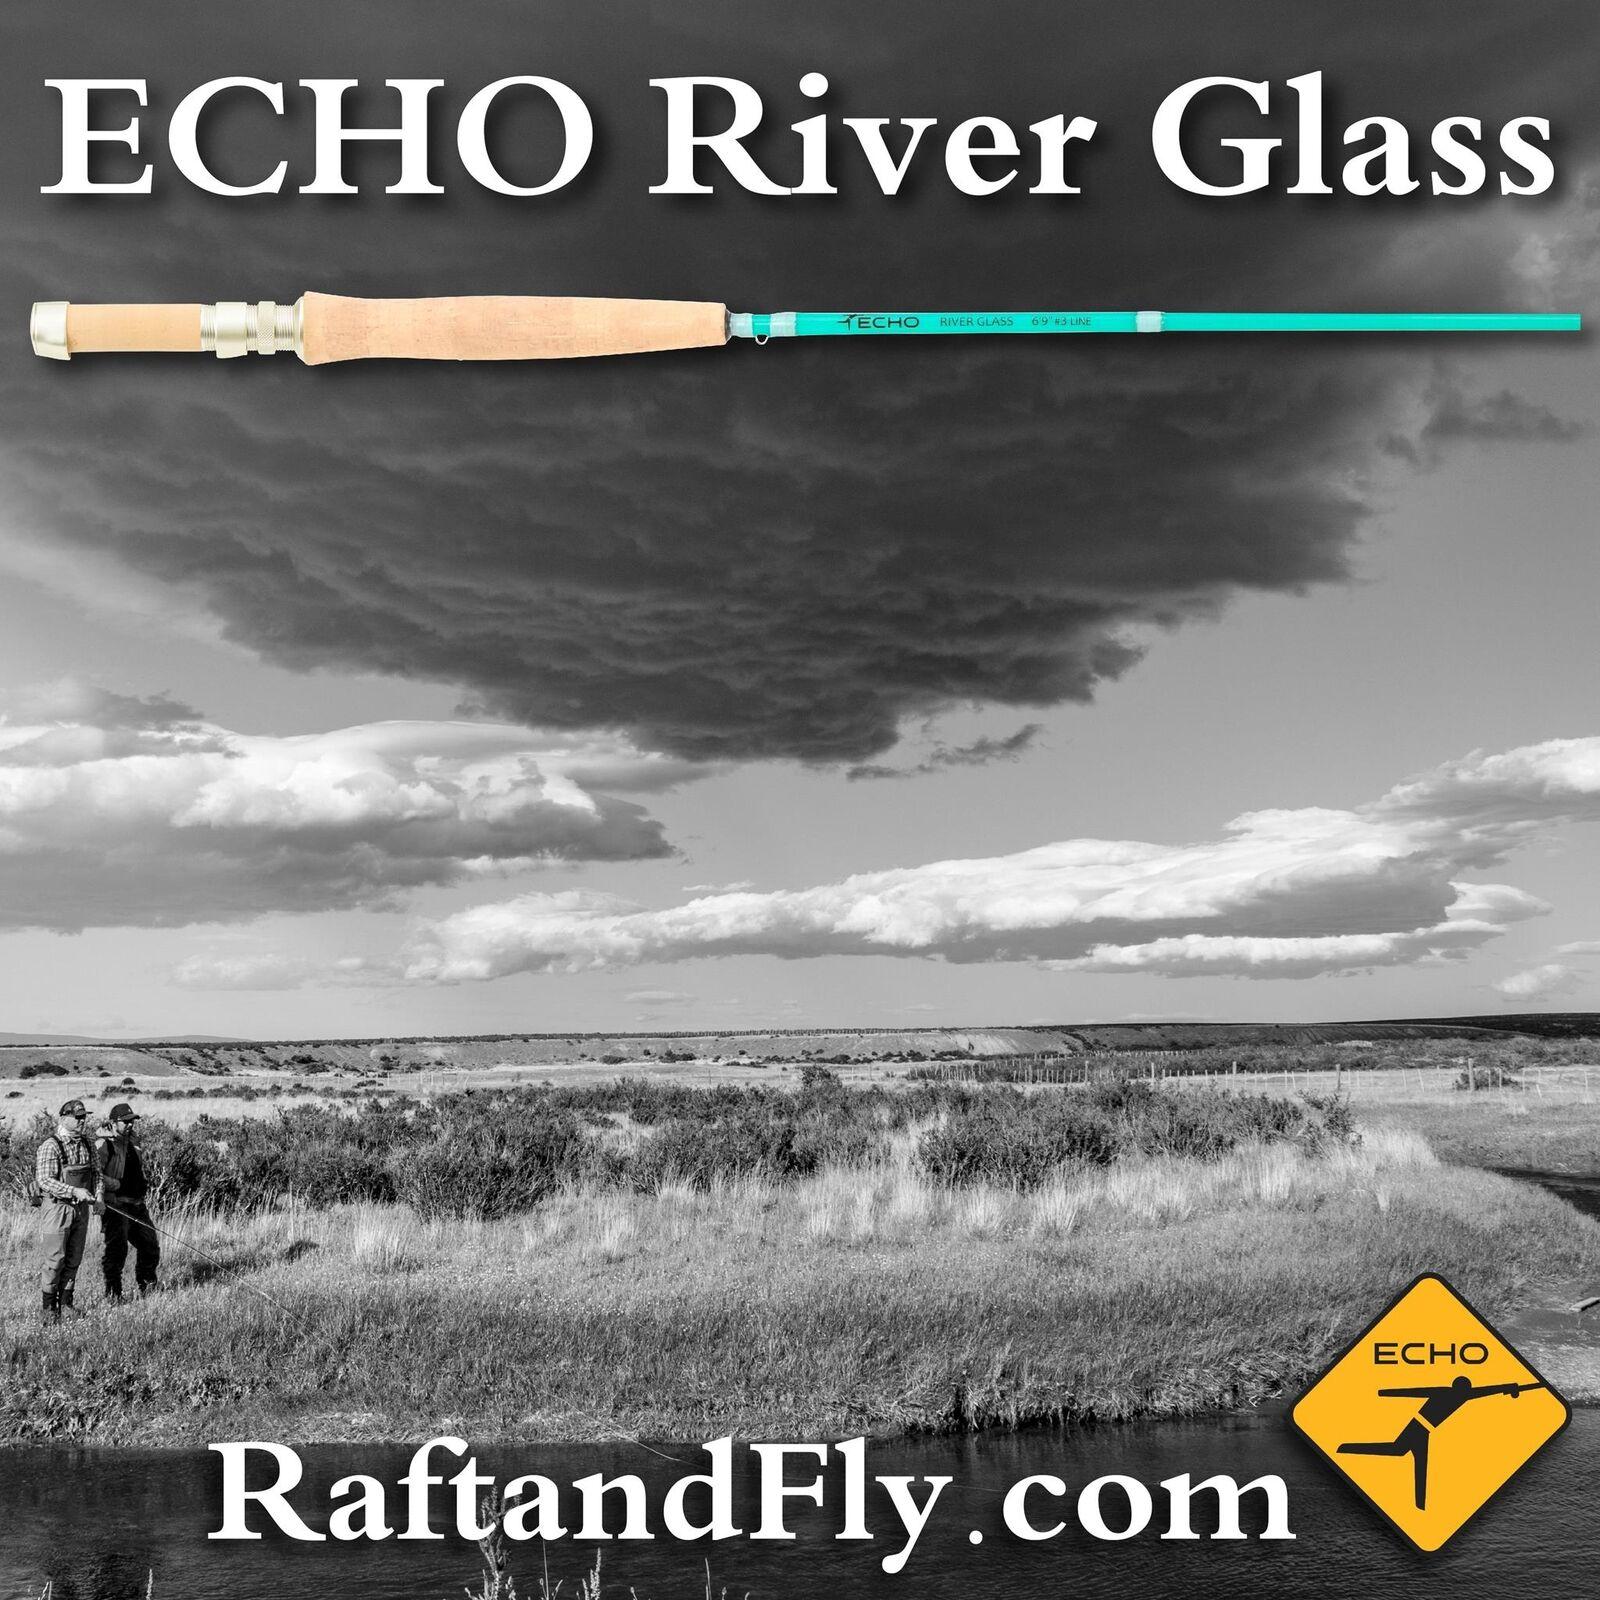 Echo Río Vidrio 5wt Glaciar Azul 8' 0  - Garantía De Por Vida-Envío Gratis